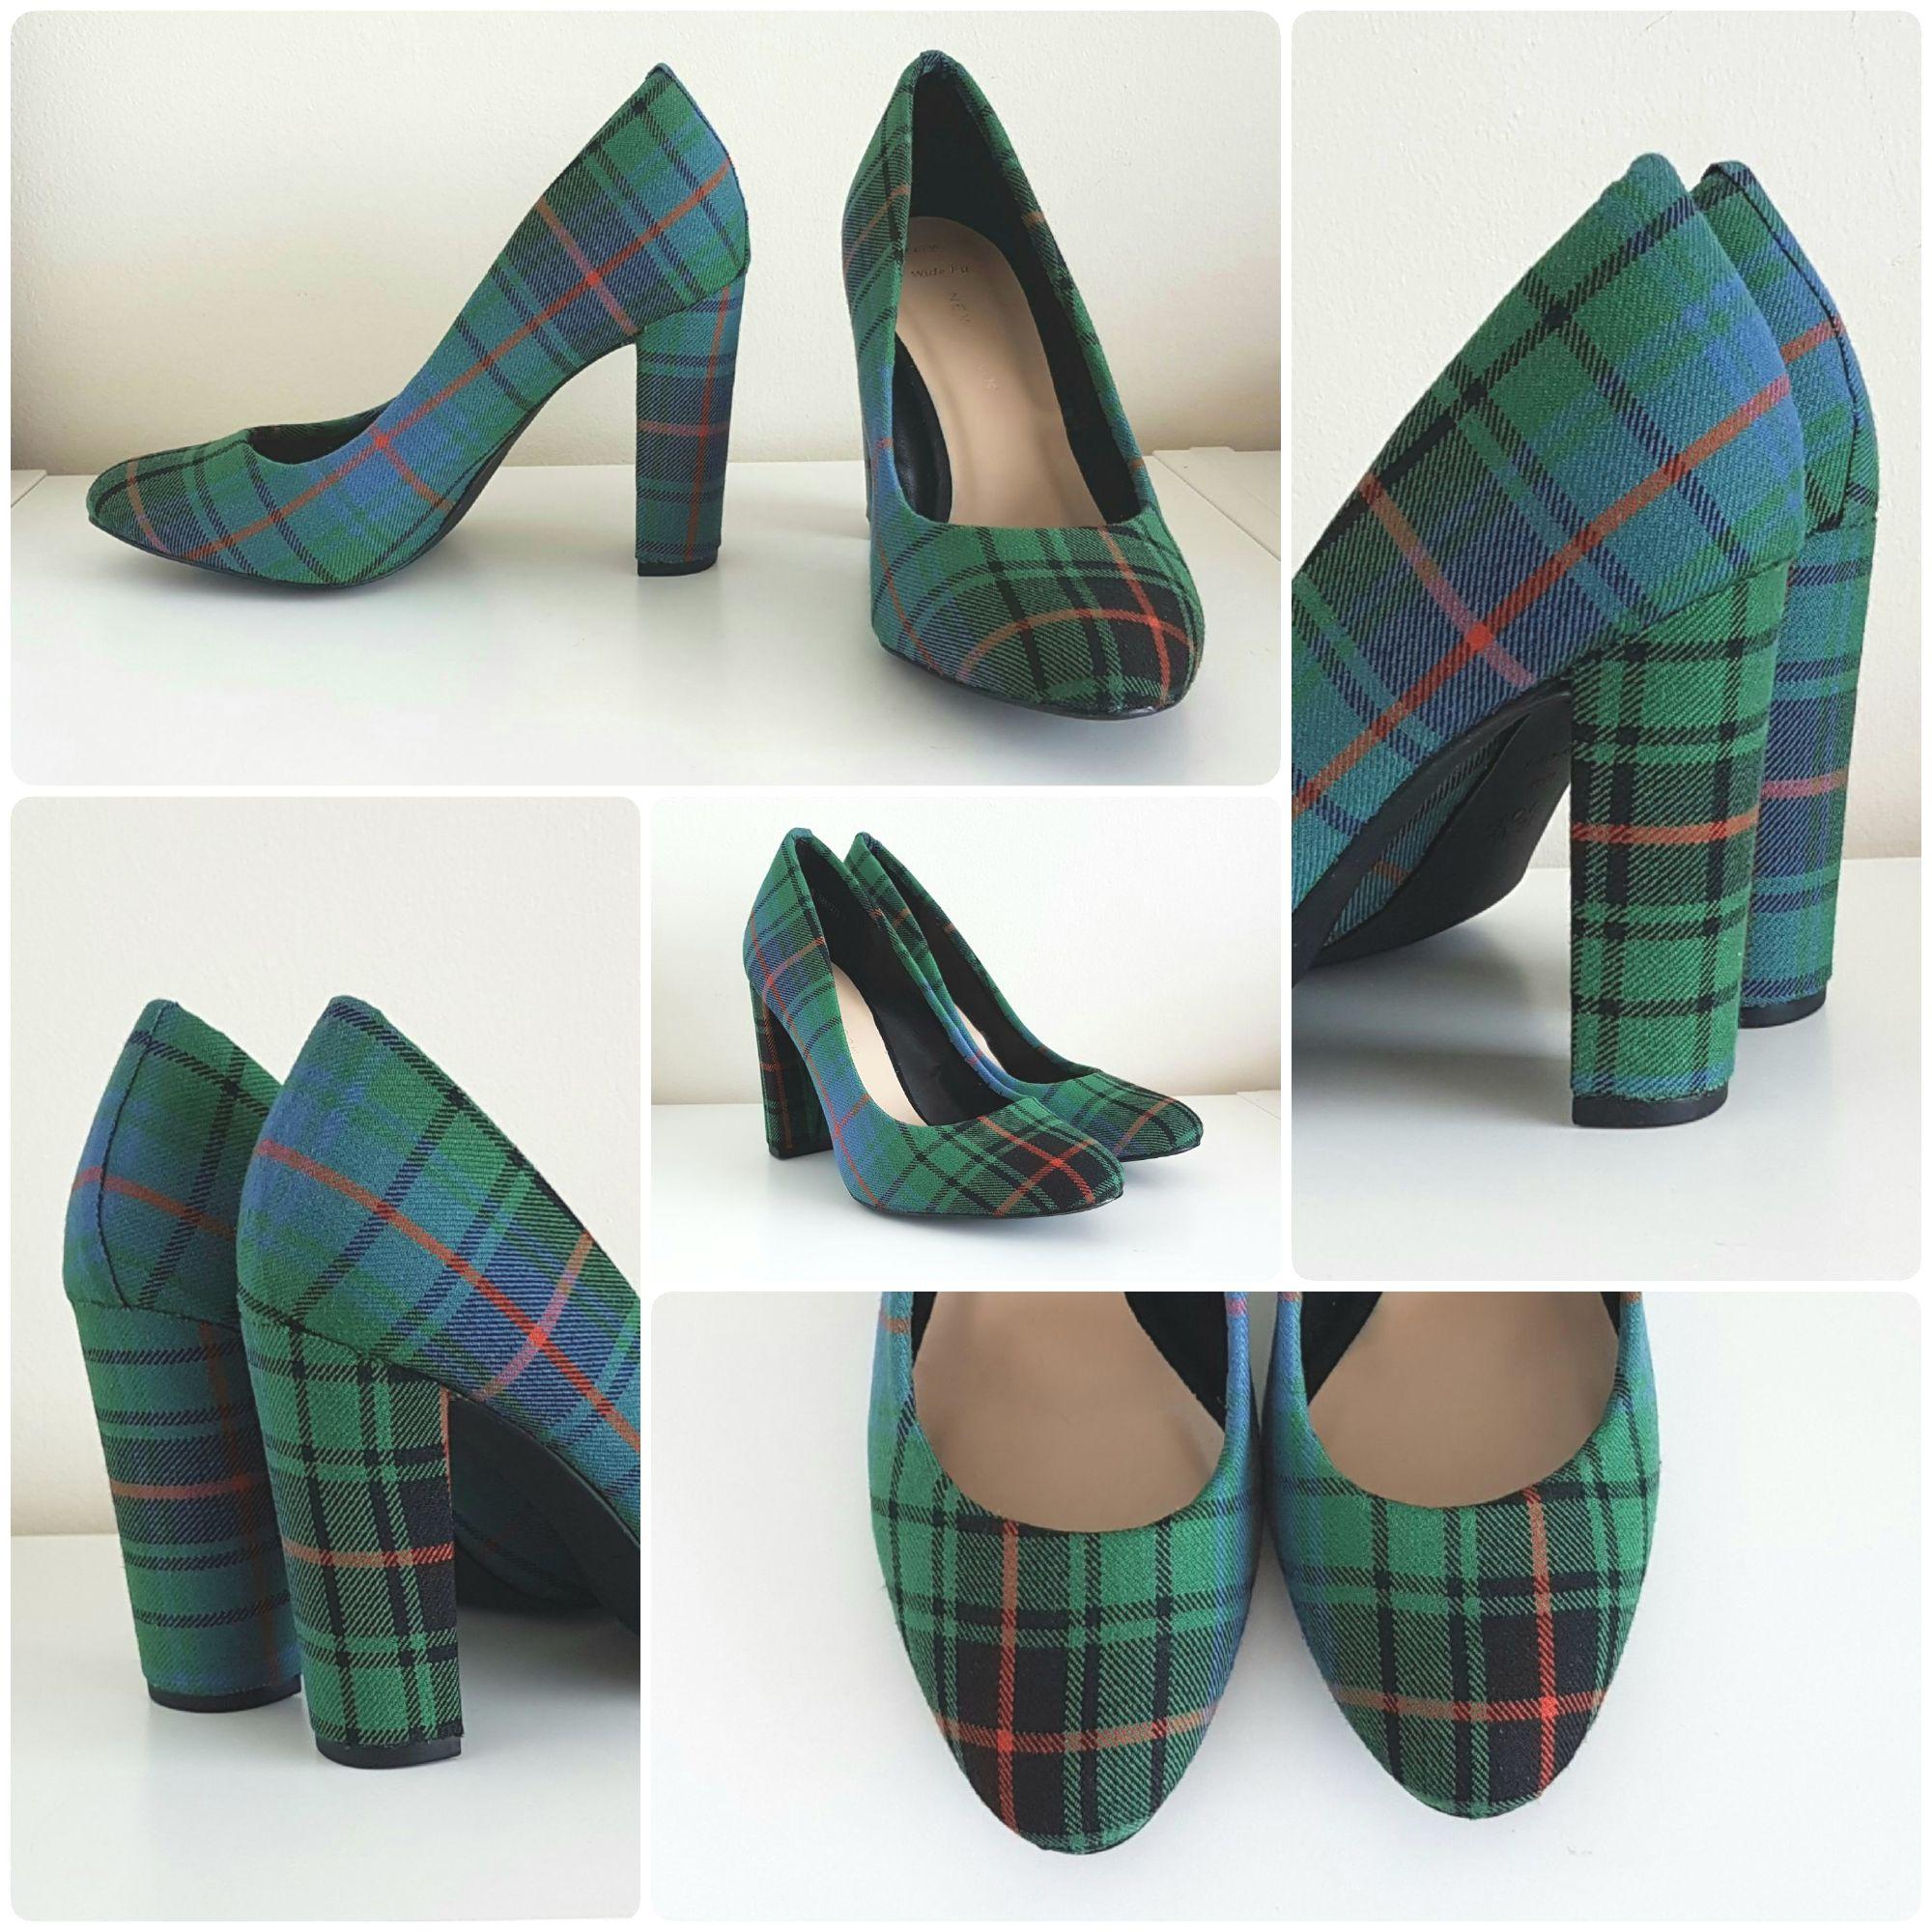 Green tartan shoes, Ancient Davidson tartan shoes, Maclean Modern tartan